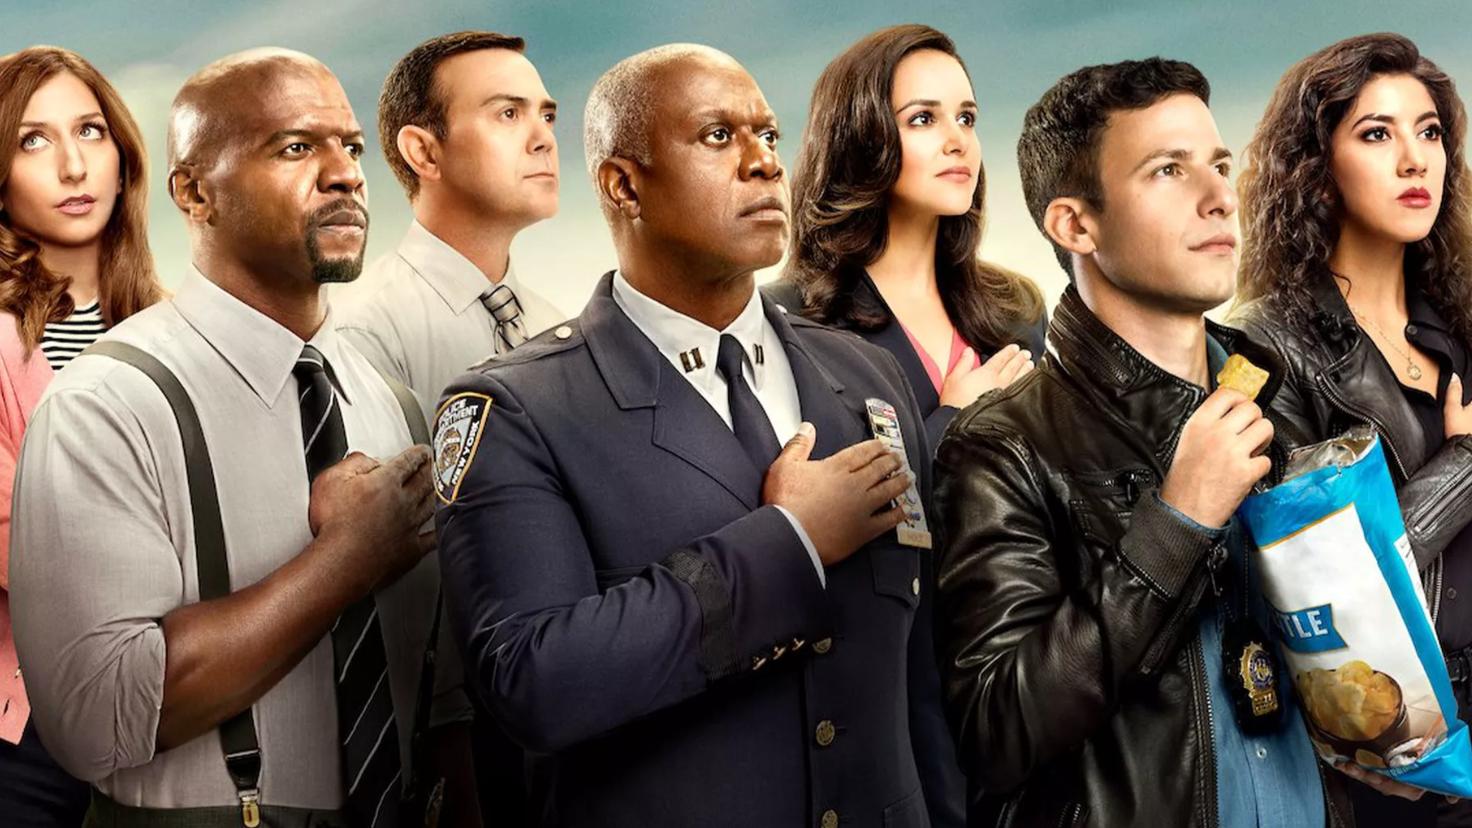 'Brooklyn Nine-Nine' Season 6 Is Coming To Netflix UK On 28th March